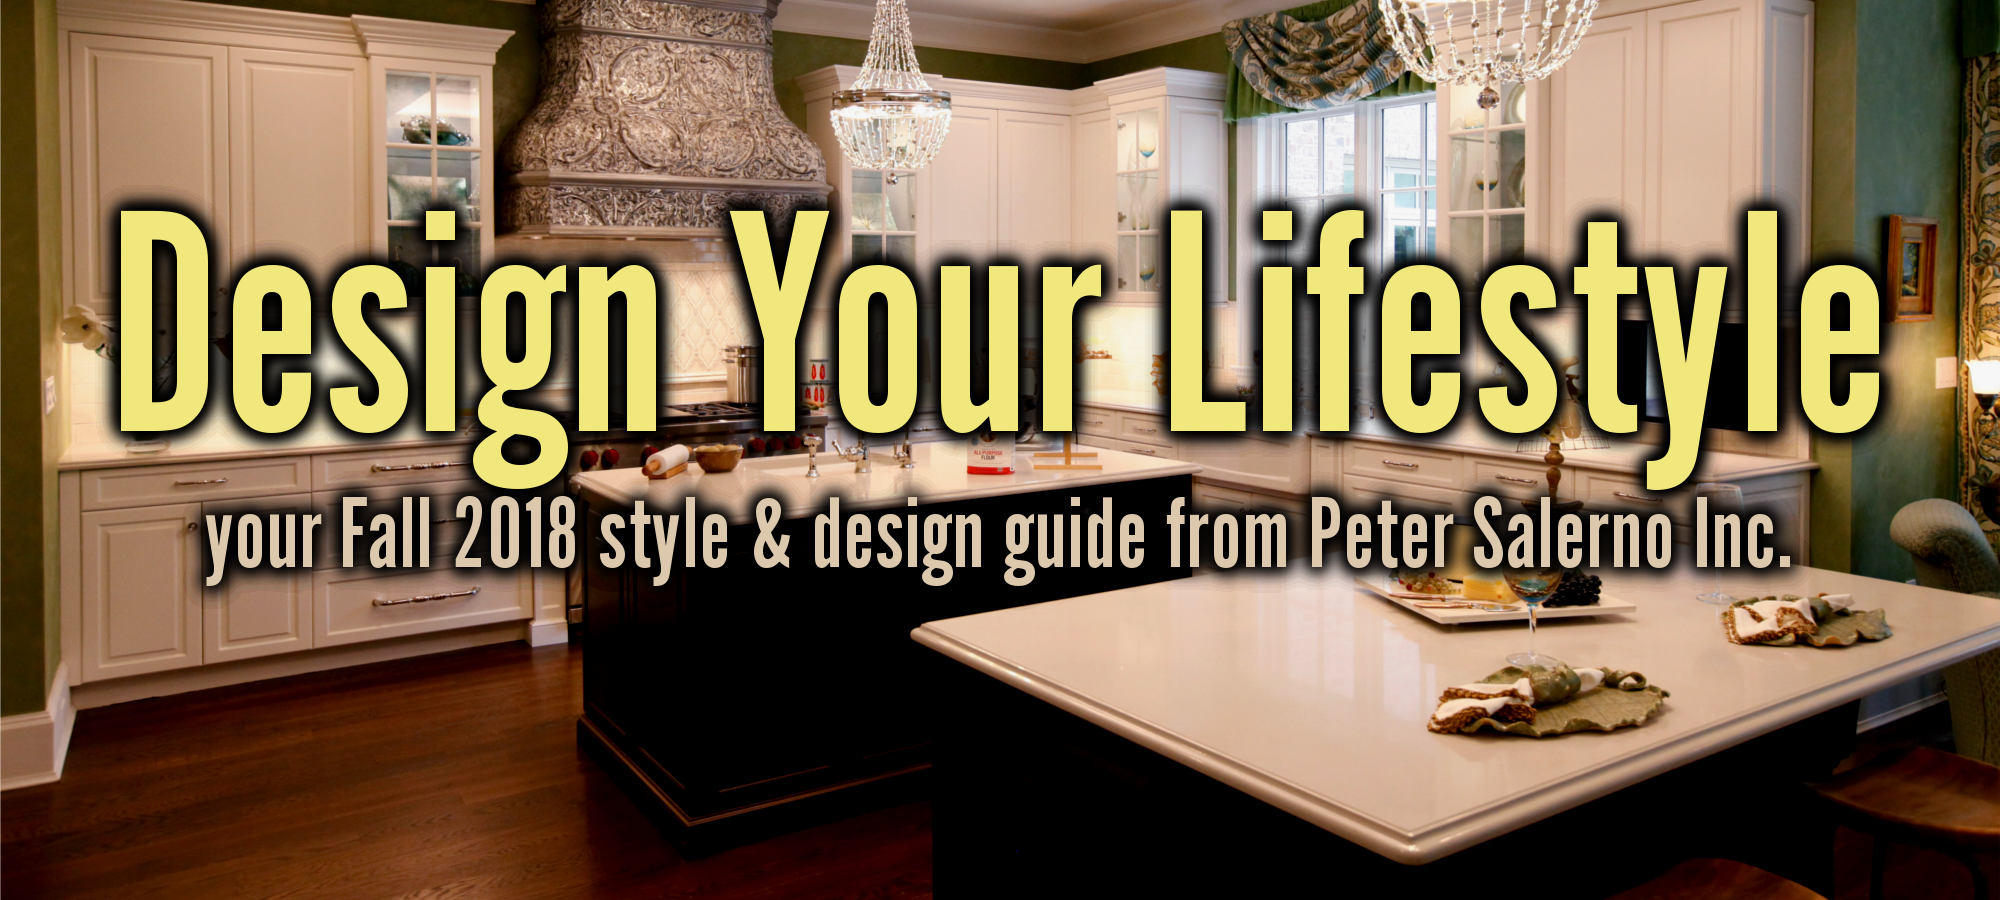 Design Your Lifestyle.